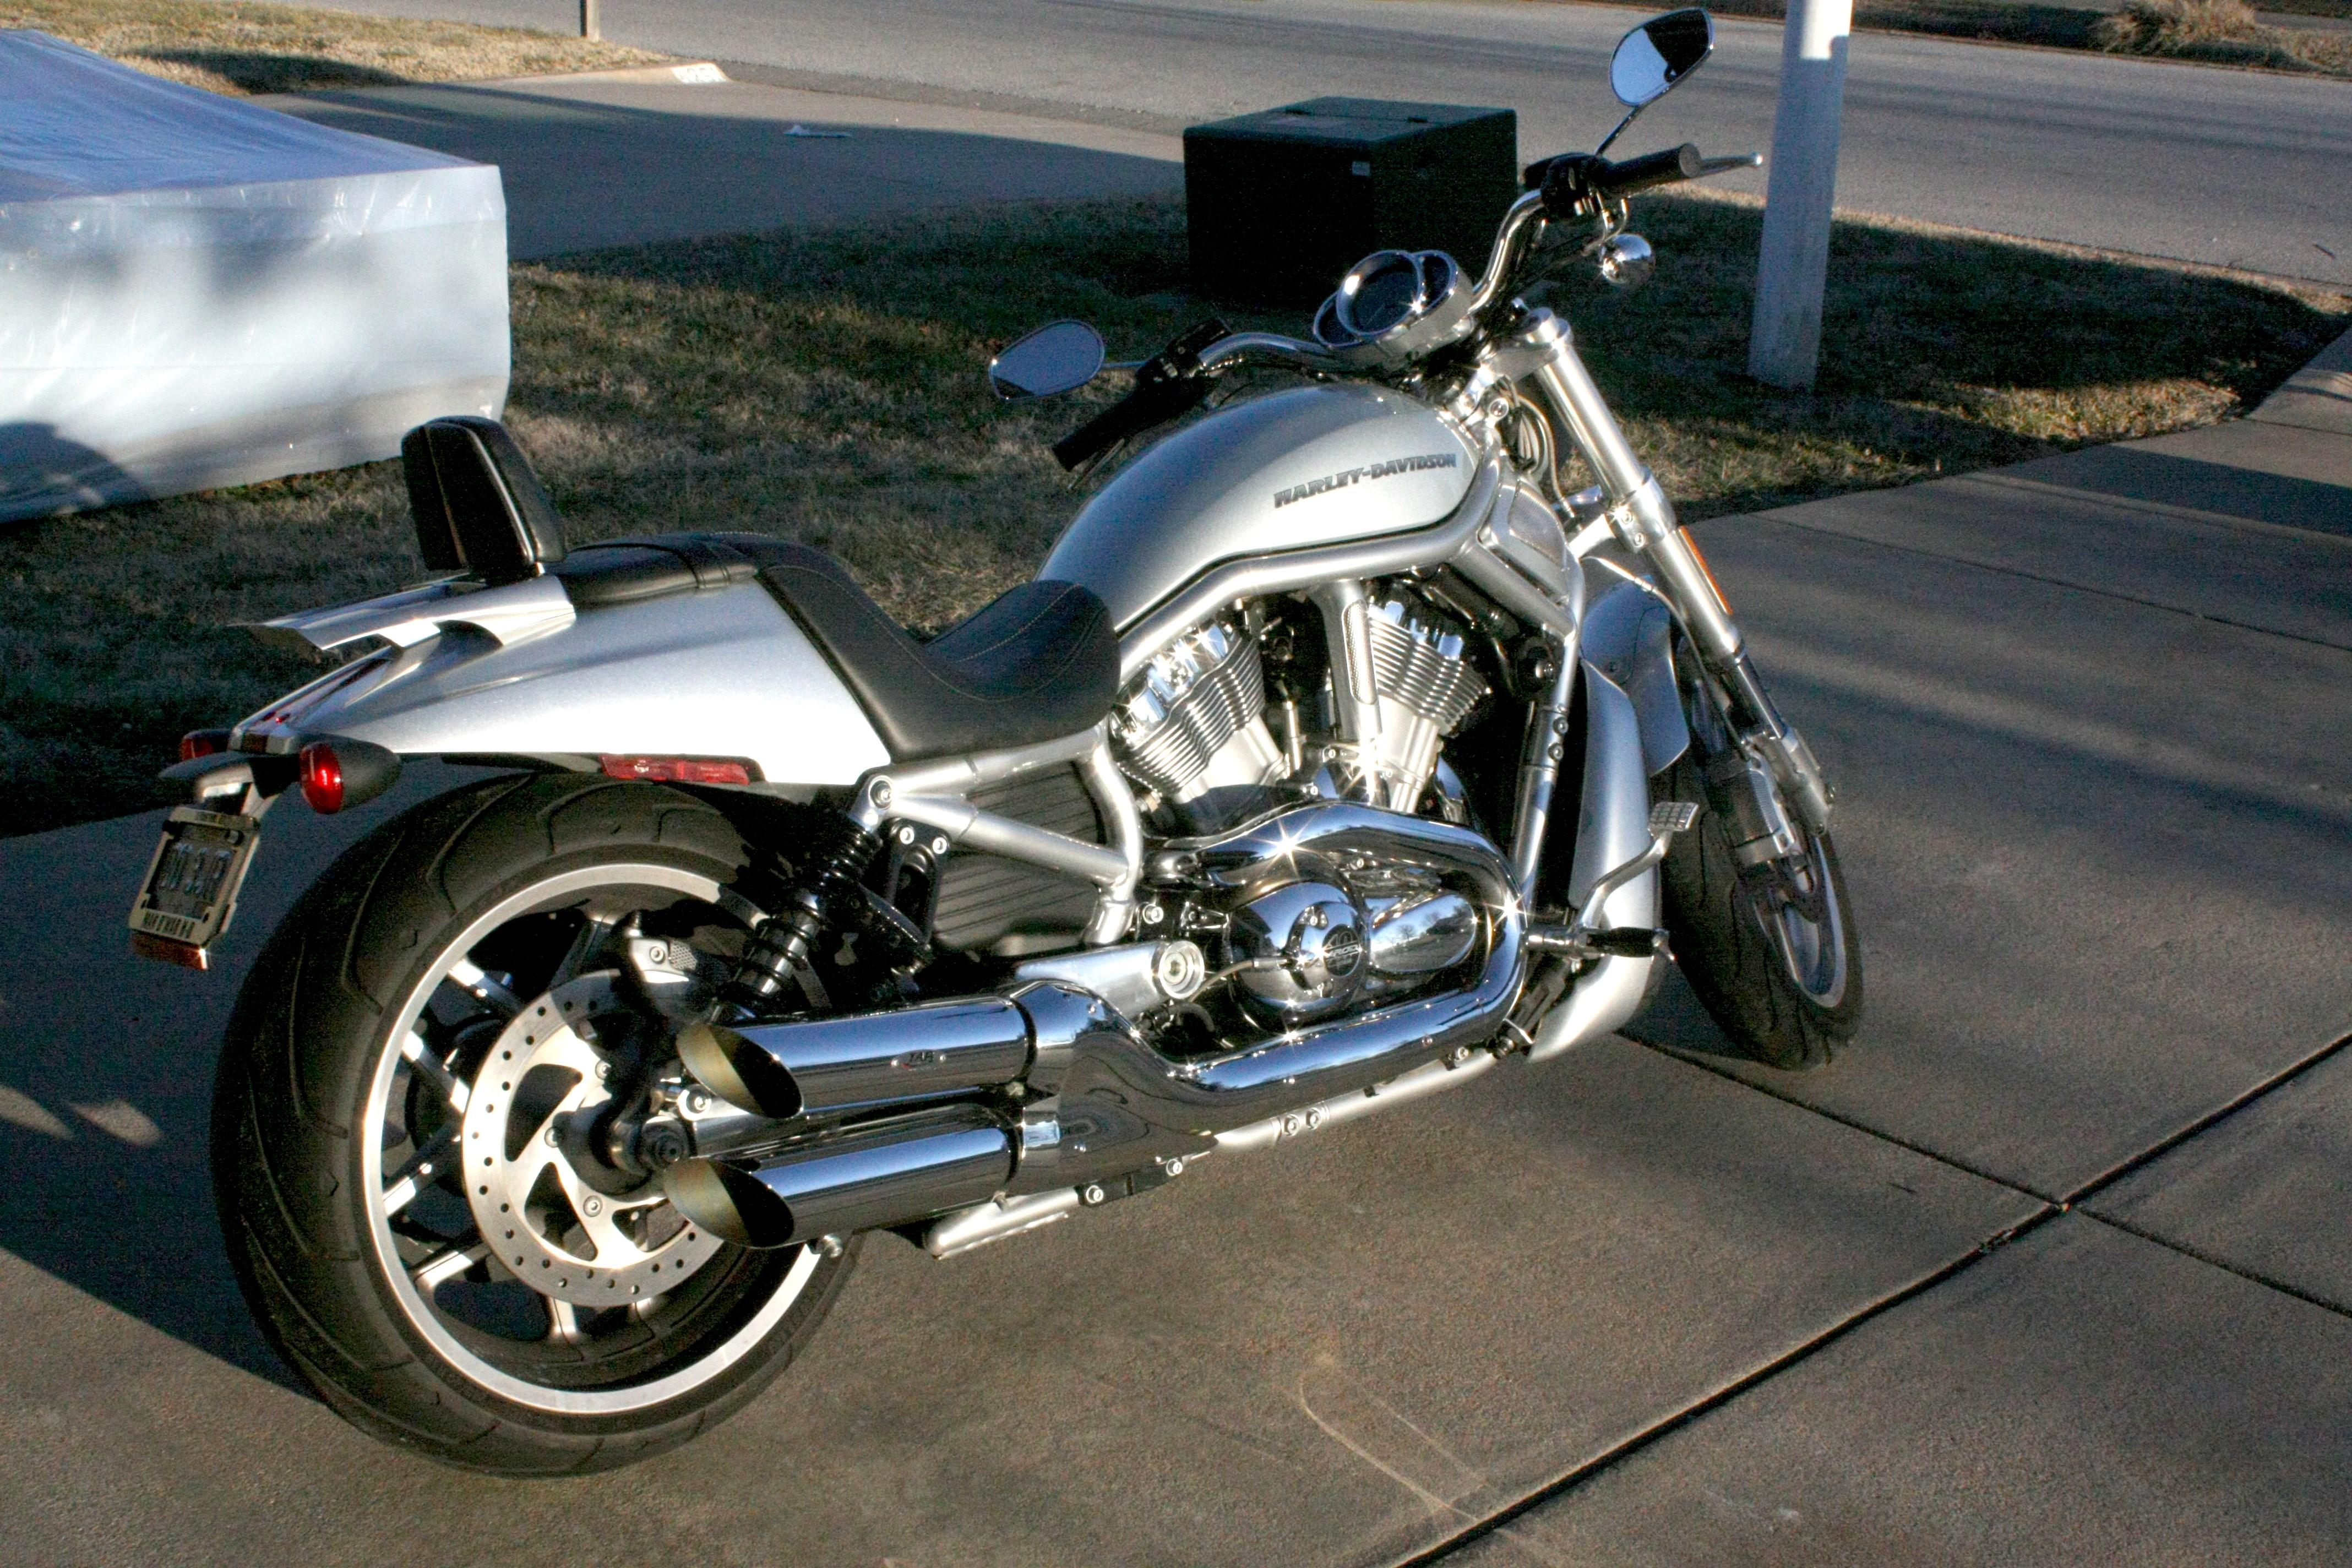 Sold 2012 Harley Davidson Vrscdx Night Rod Special: 2012 Harley-Davidson® VRSCDX V-Rod® Night Rod® Special